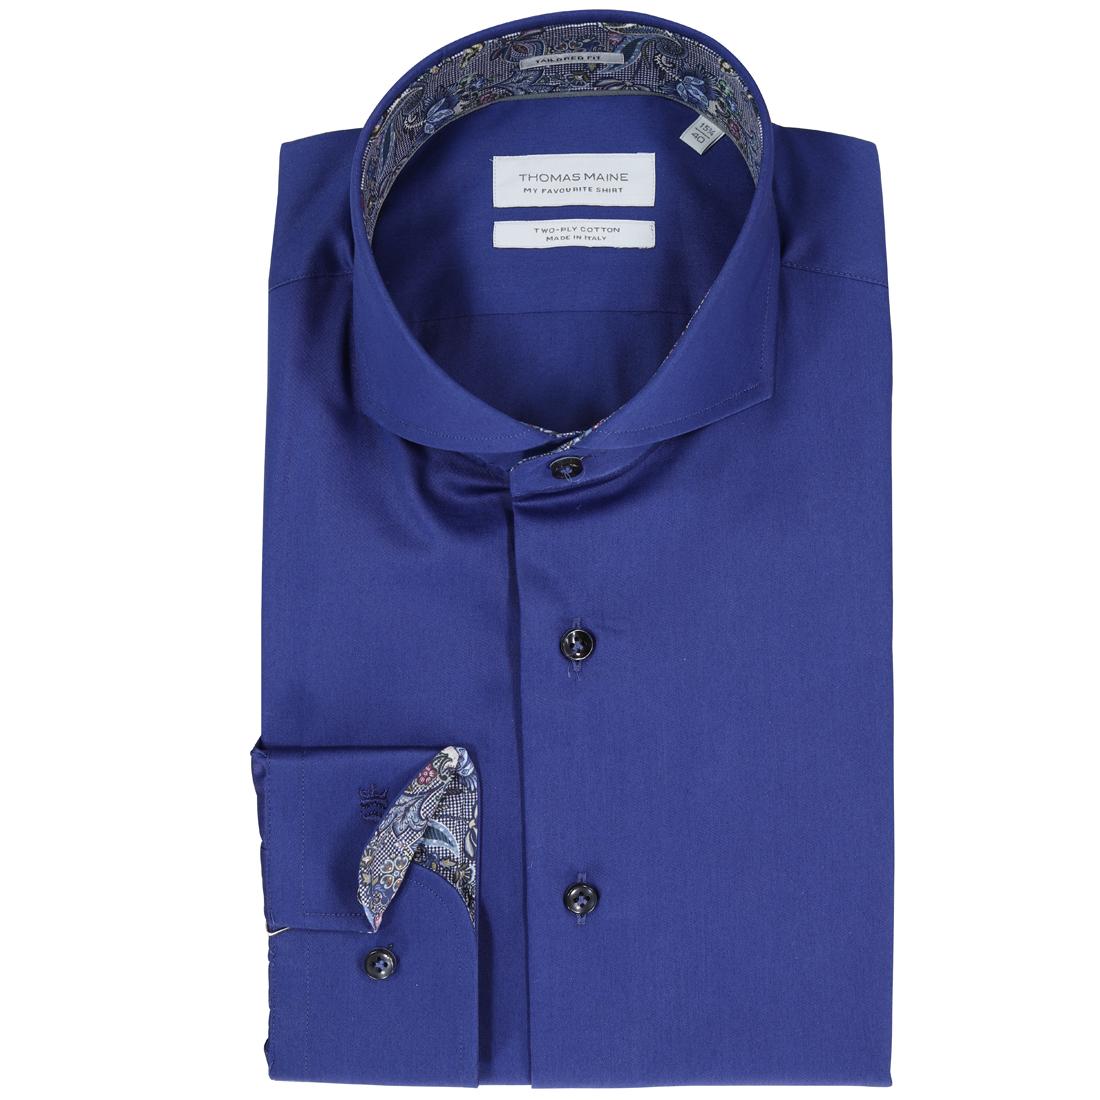 Image of Thomas Maine overhemd 827700 in het Bruin